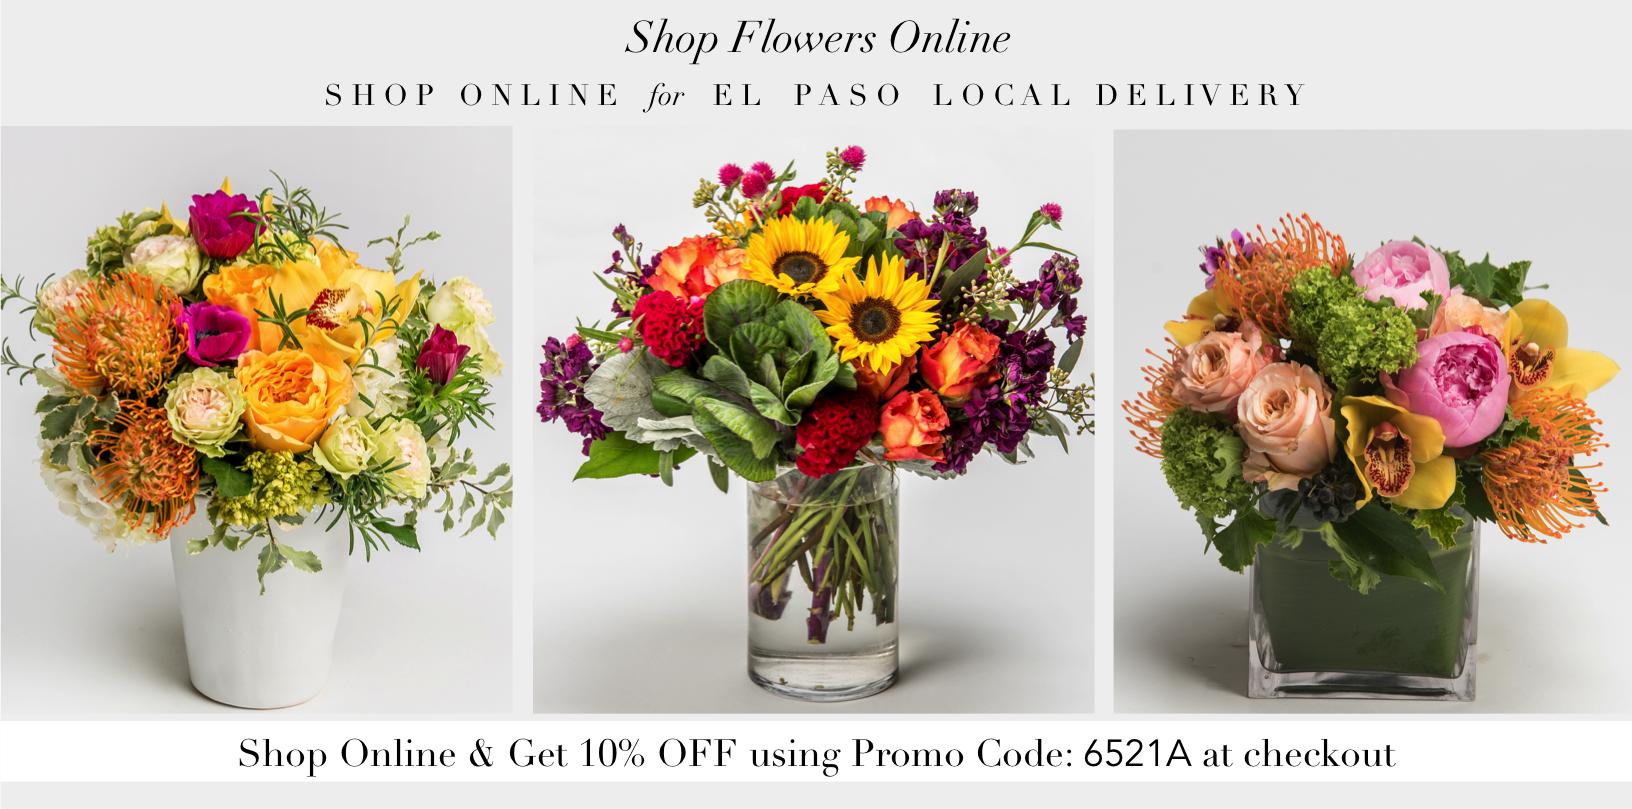 07-angies-floral-designs-el-paso-florist-el-paso-texas-fall-flowers-shop-online-el-paso-florist-floreria-floral-designs-.png